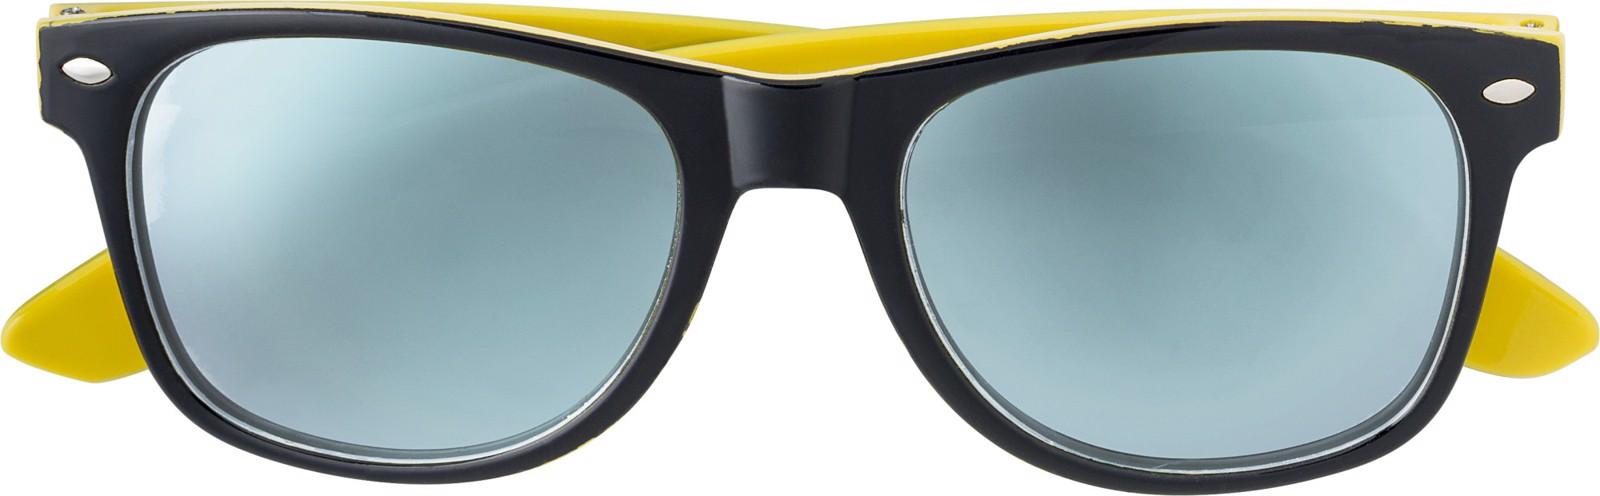 Acrylic sunglasses - Yellow